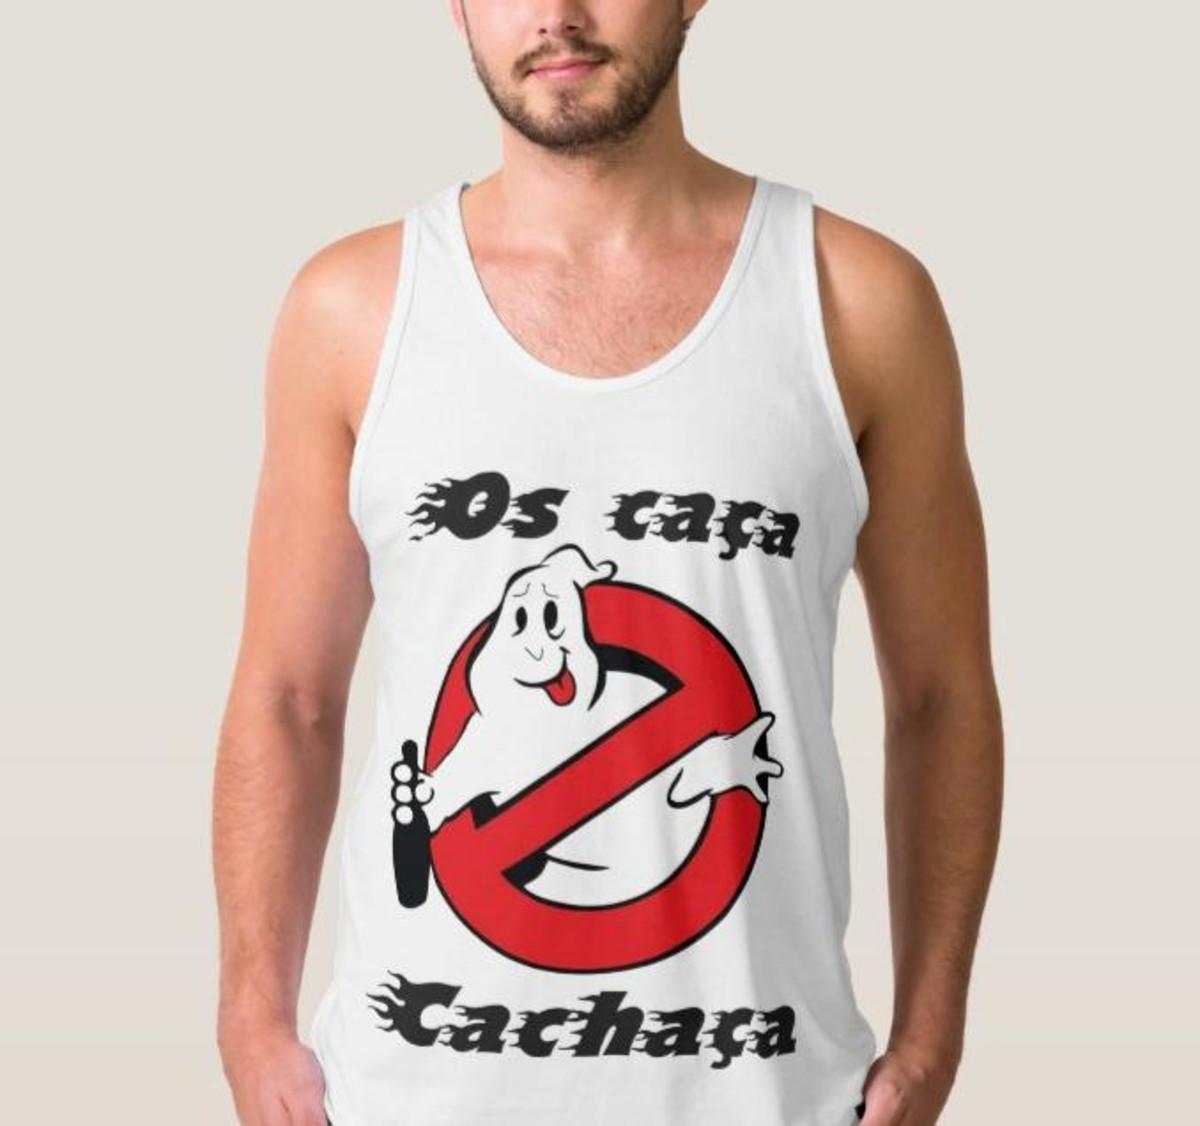 Camiseta Regata Masculina no Elo7  0da4629a29b